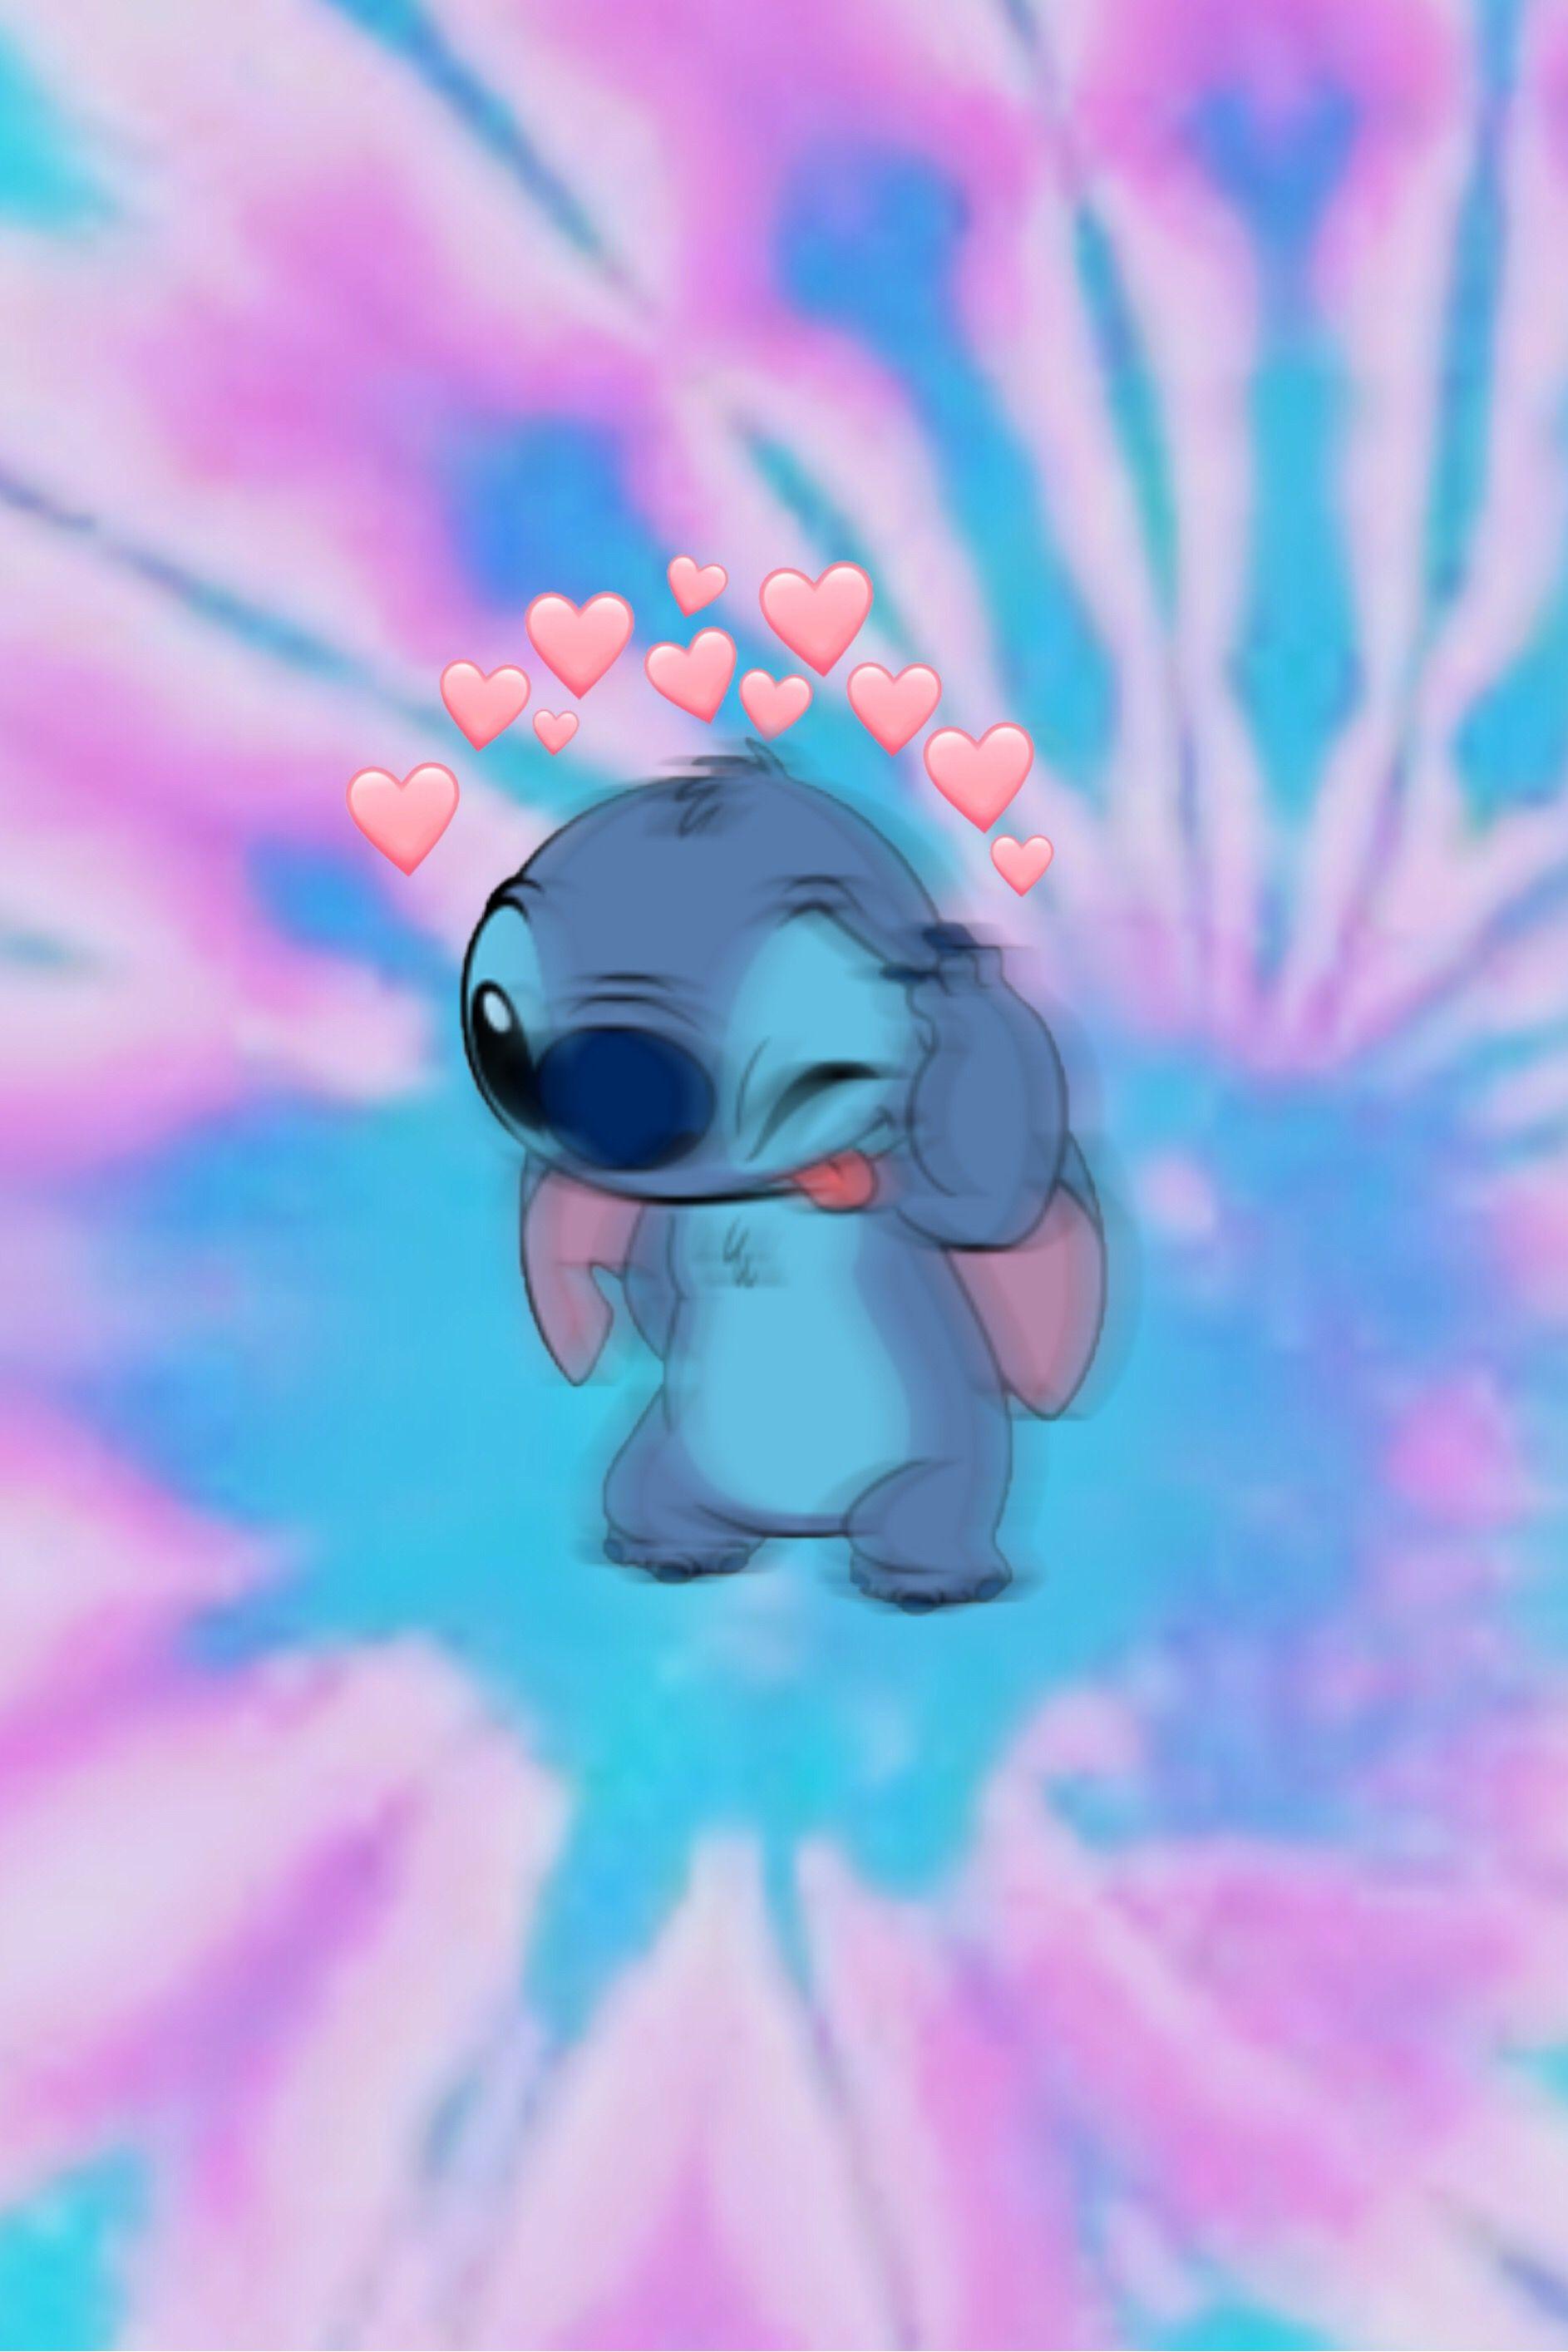 I Love Lilo And Stitch Lilo And Stitch Drawings Cartoon Wallpaper Stitch Cartoon